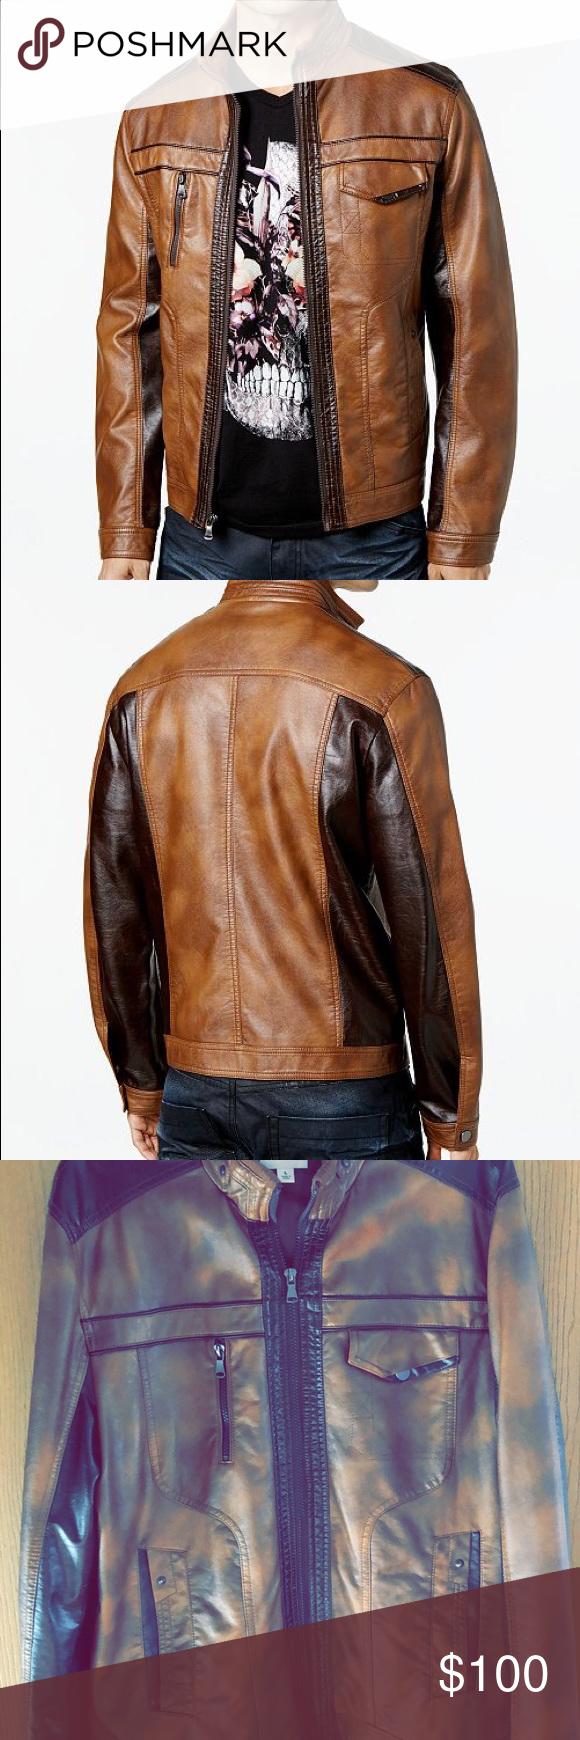 I N C Men S Jones Two Tone Faux Leather Jacket Leather Jacket Brands Leather Jacket Faux Leather Jackets [ 1740 x 580 Pixel ]